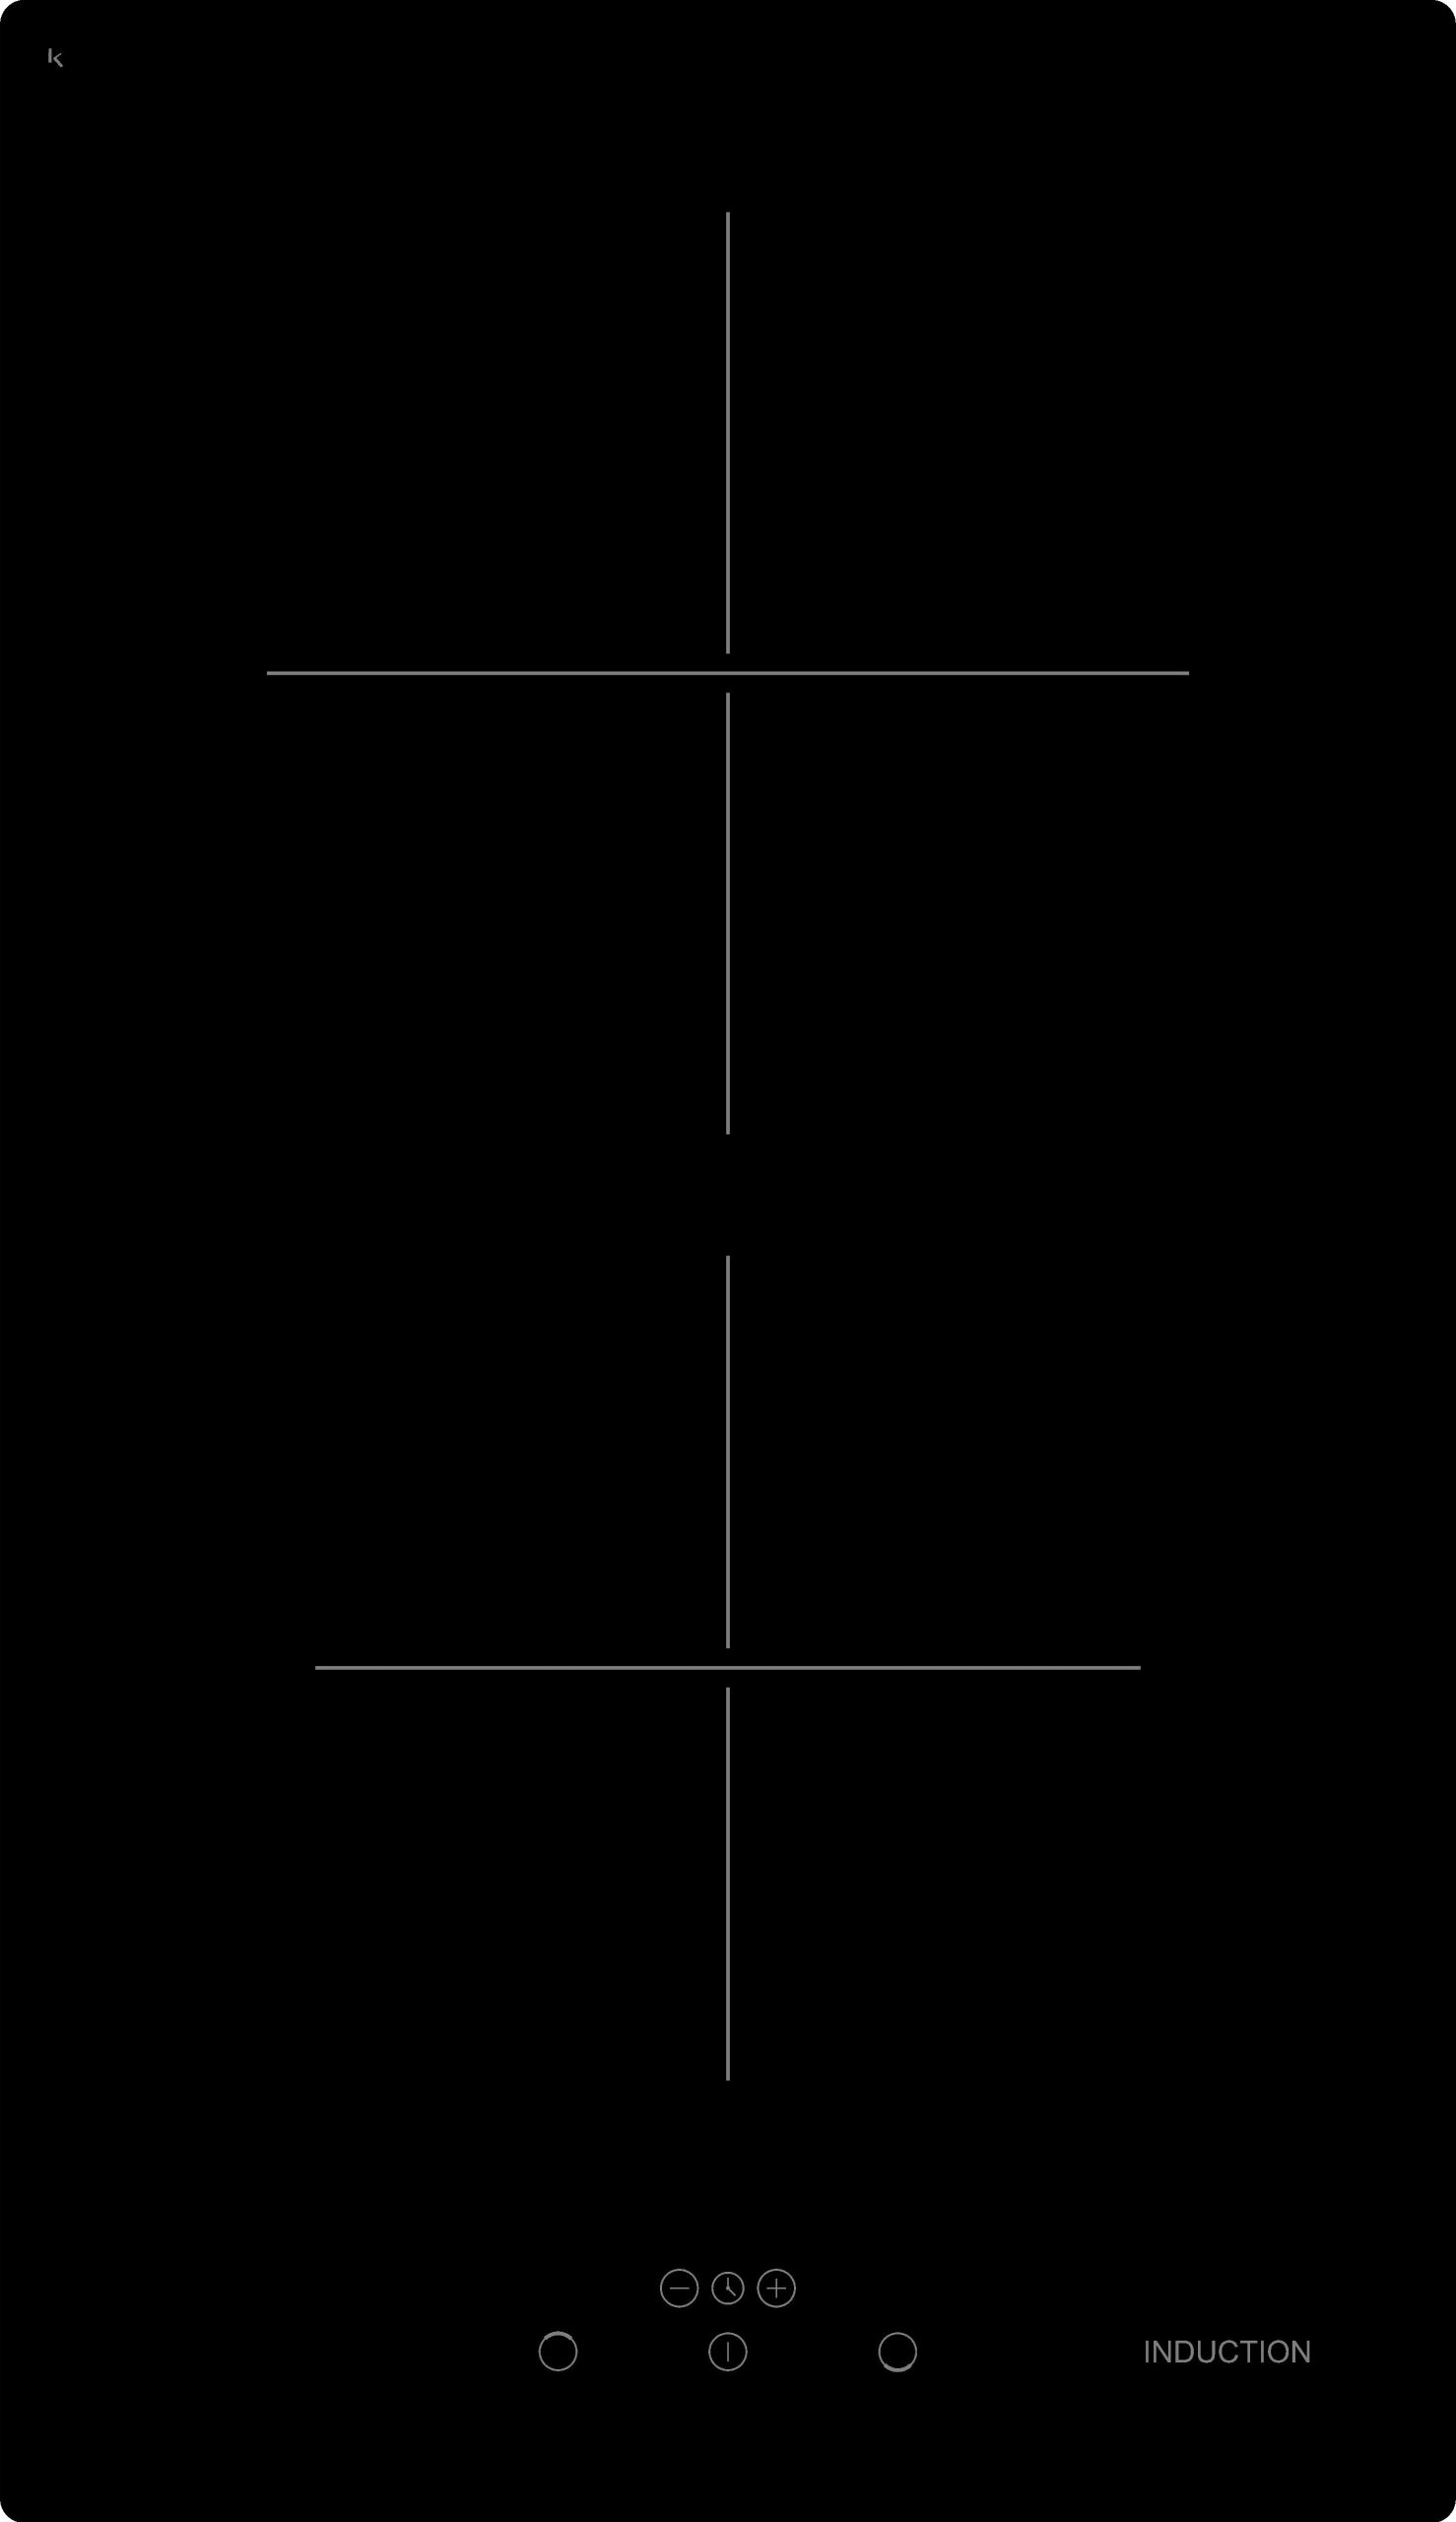 Evido HID32B.2 Domino-I 32B.2 beépíthető indukciós főzőlap